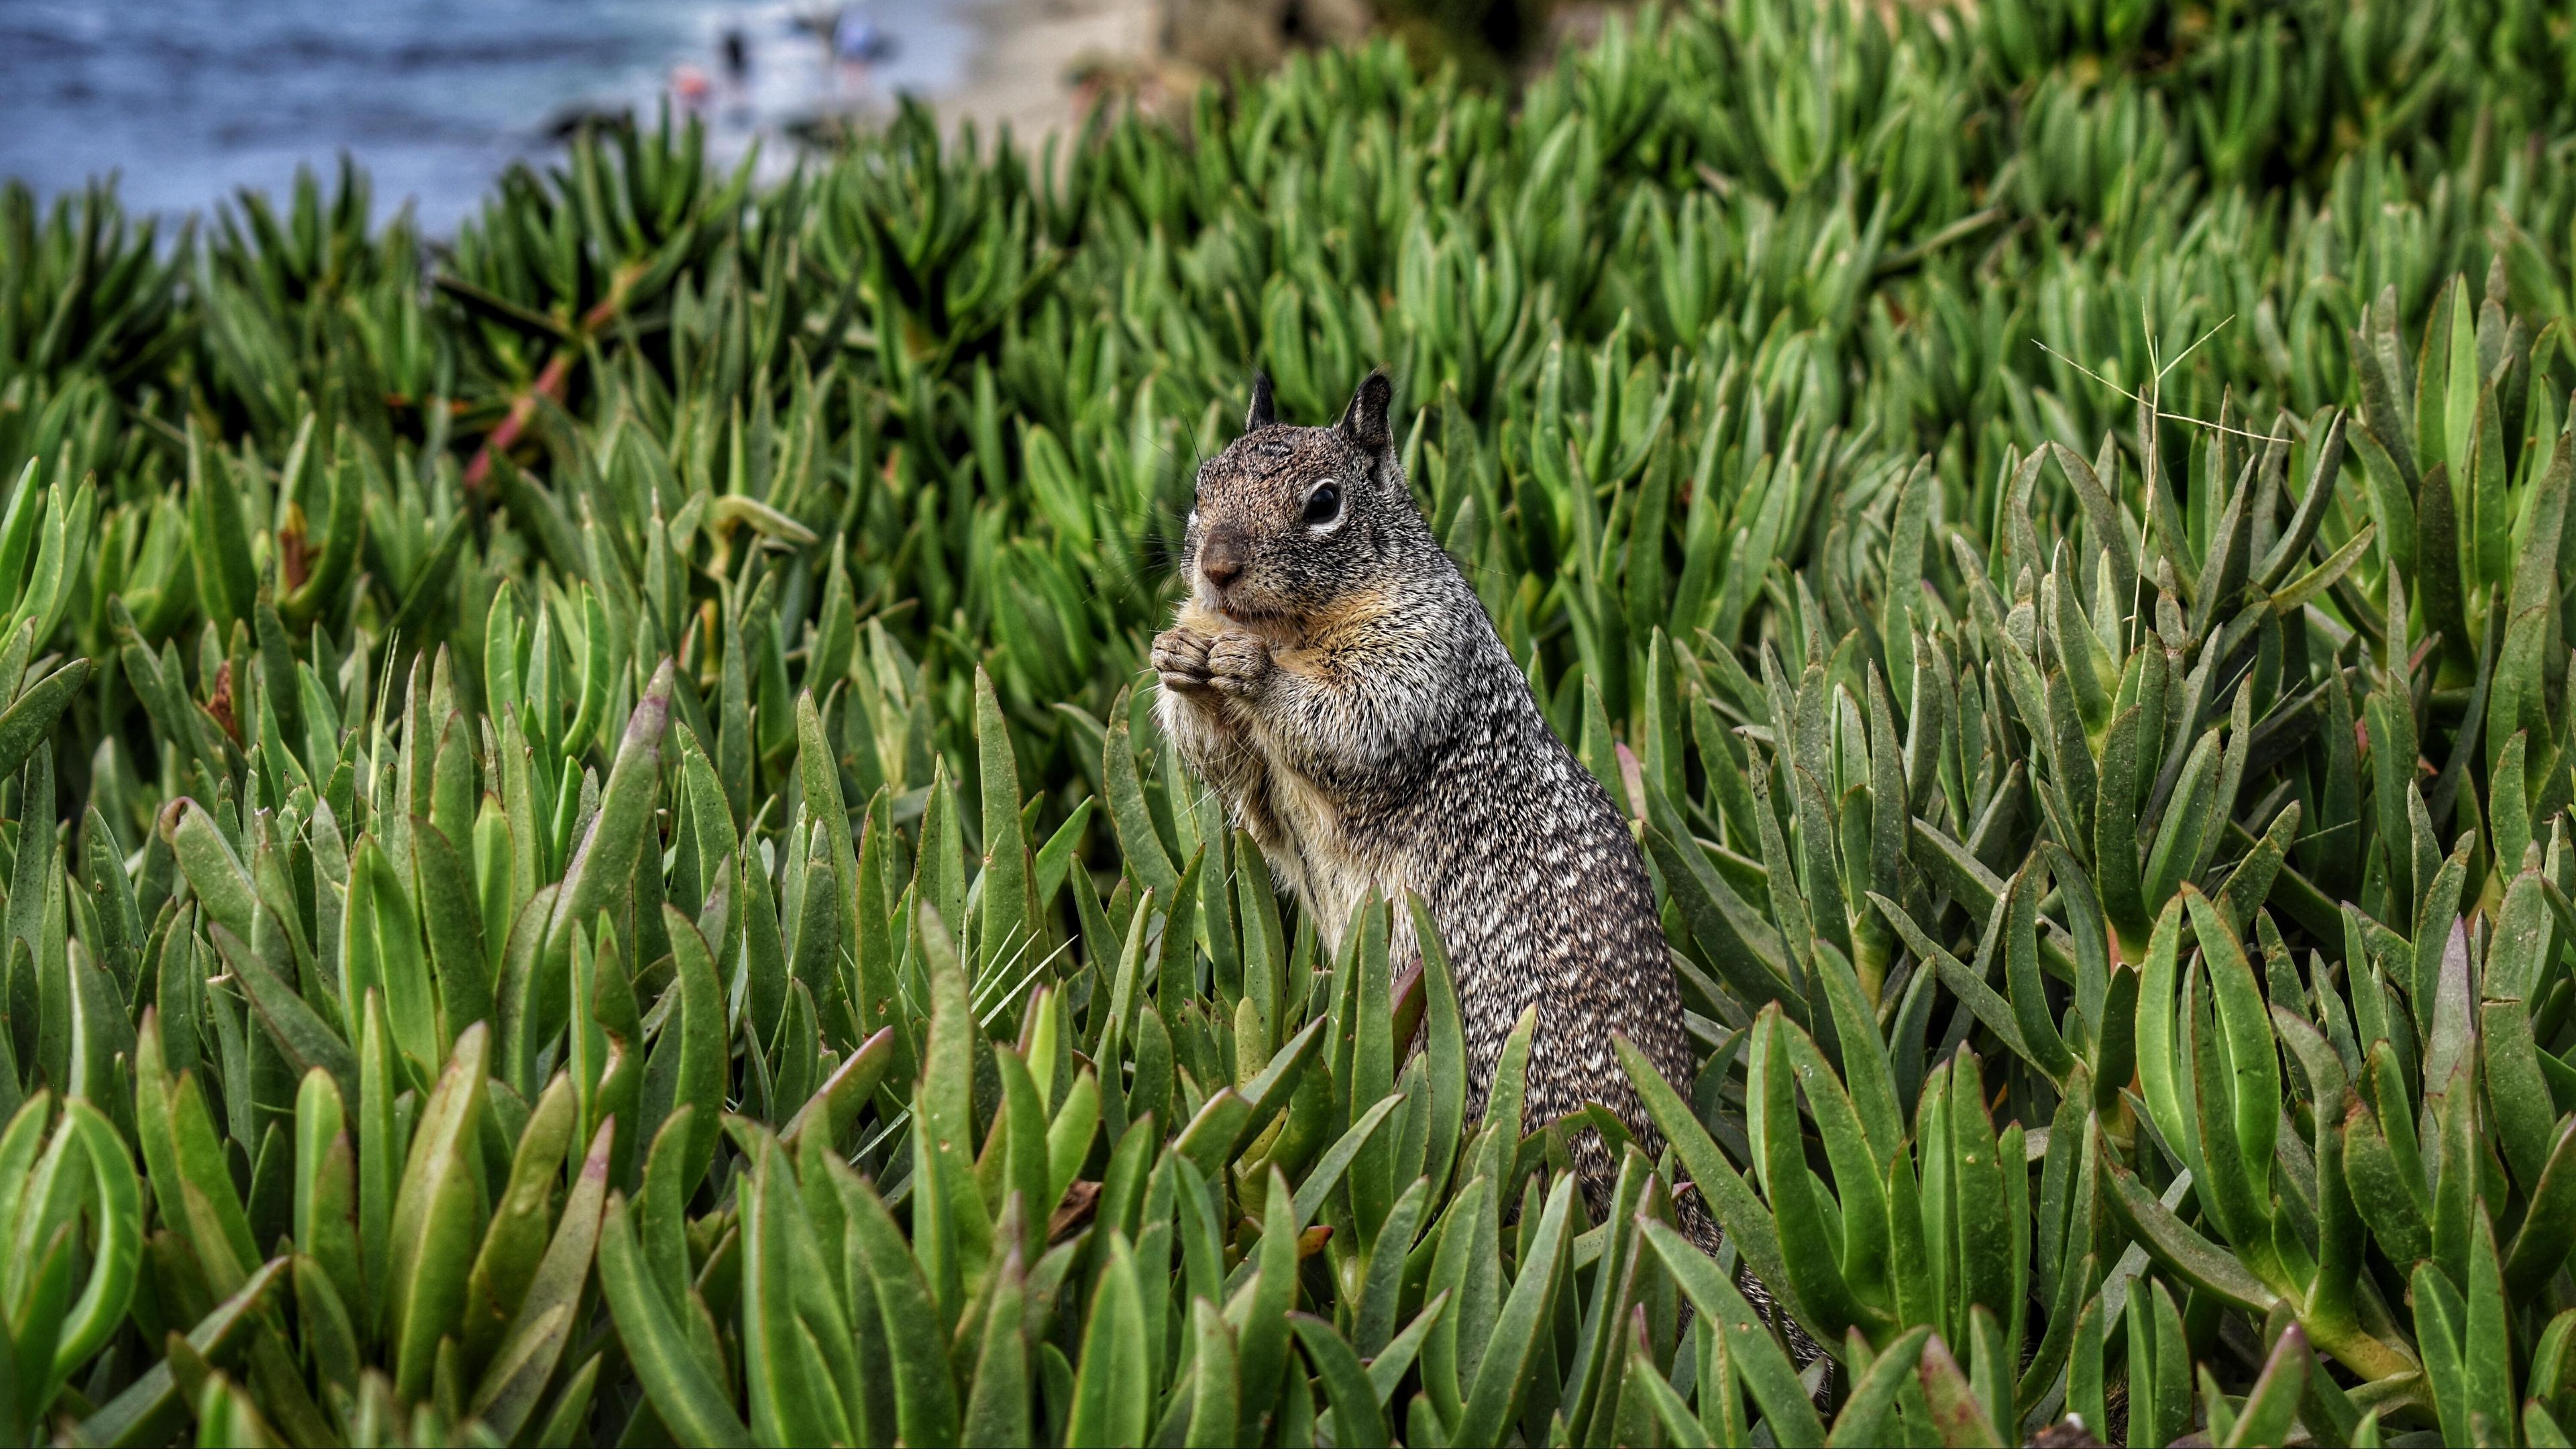 squirrel rodent grass 4k 1542241493 - squirrel, rodent, grass 4k - Squirrel, rodent, Grass